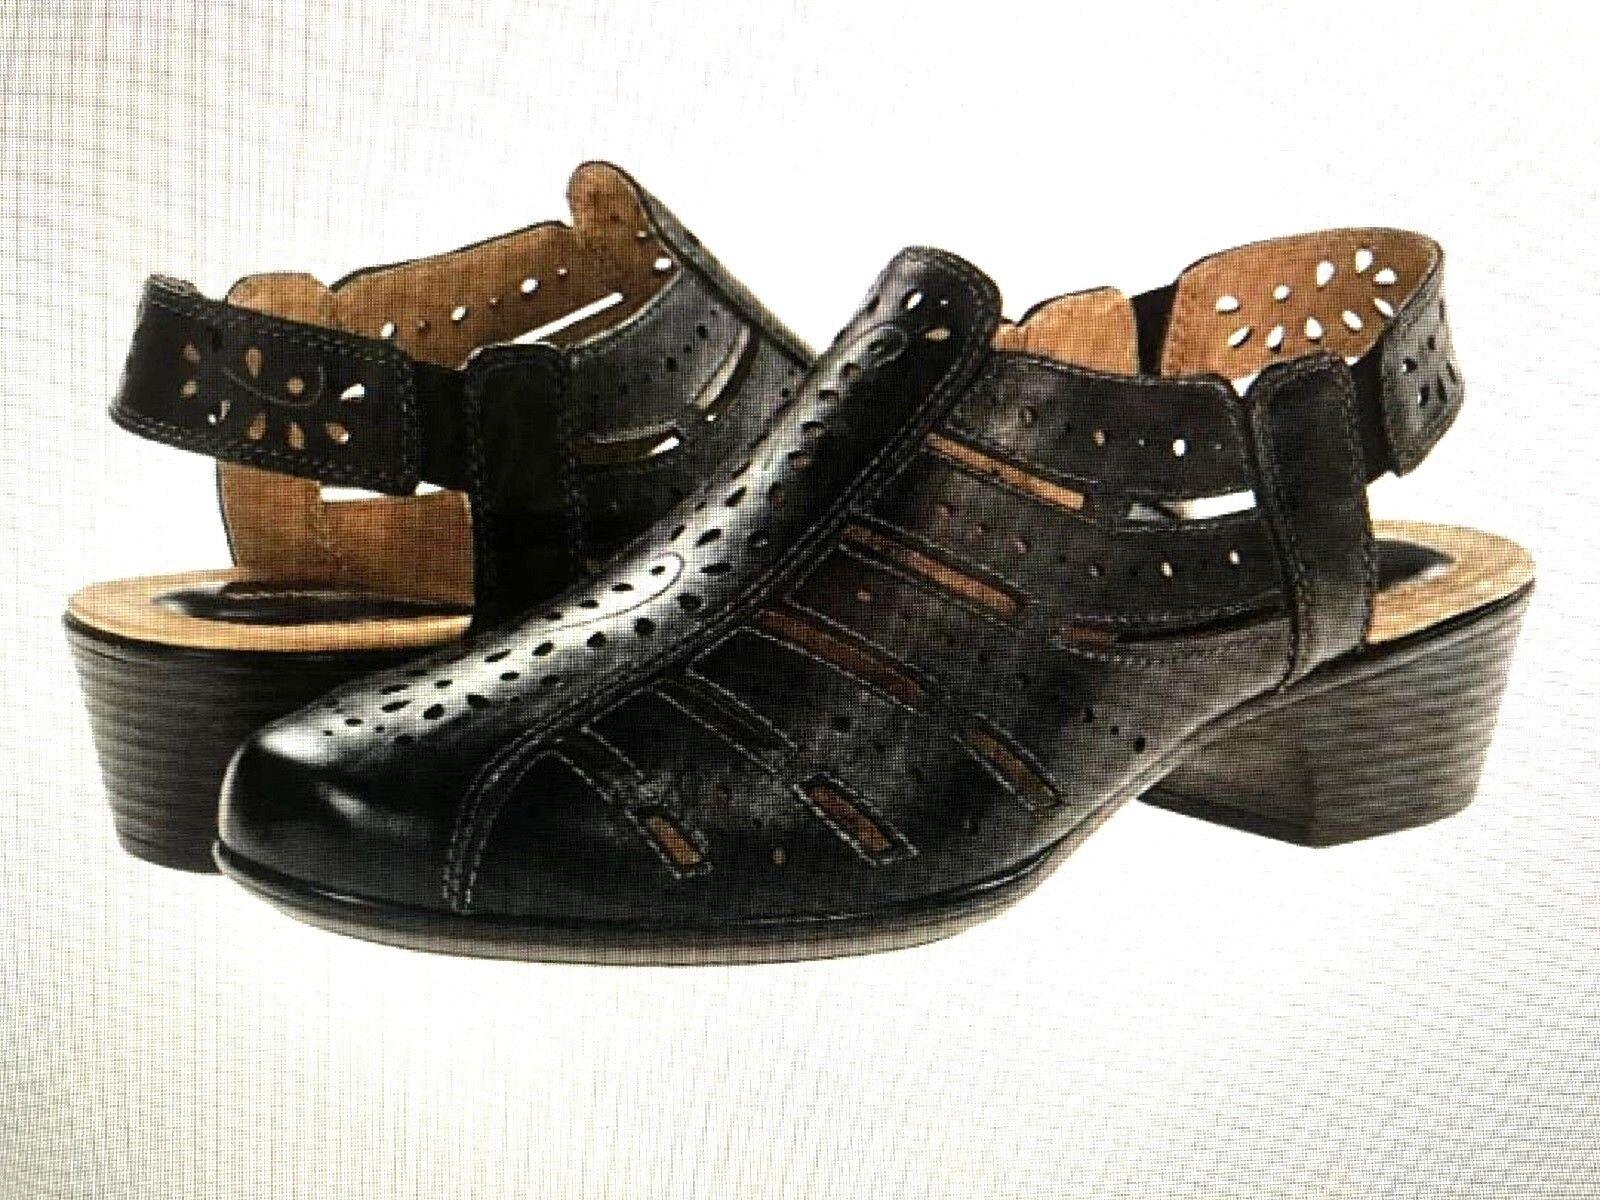 ROMIKA-'BARBADOS 06' Perforated Leather Sandals -noir  Sz. 5.5 M (36 EU)